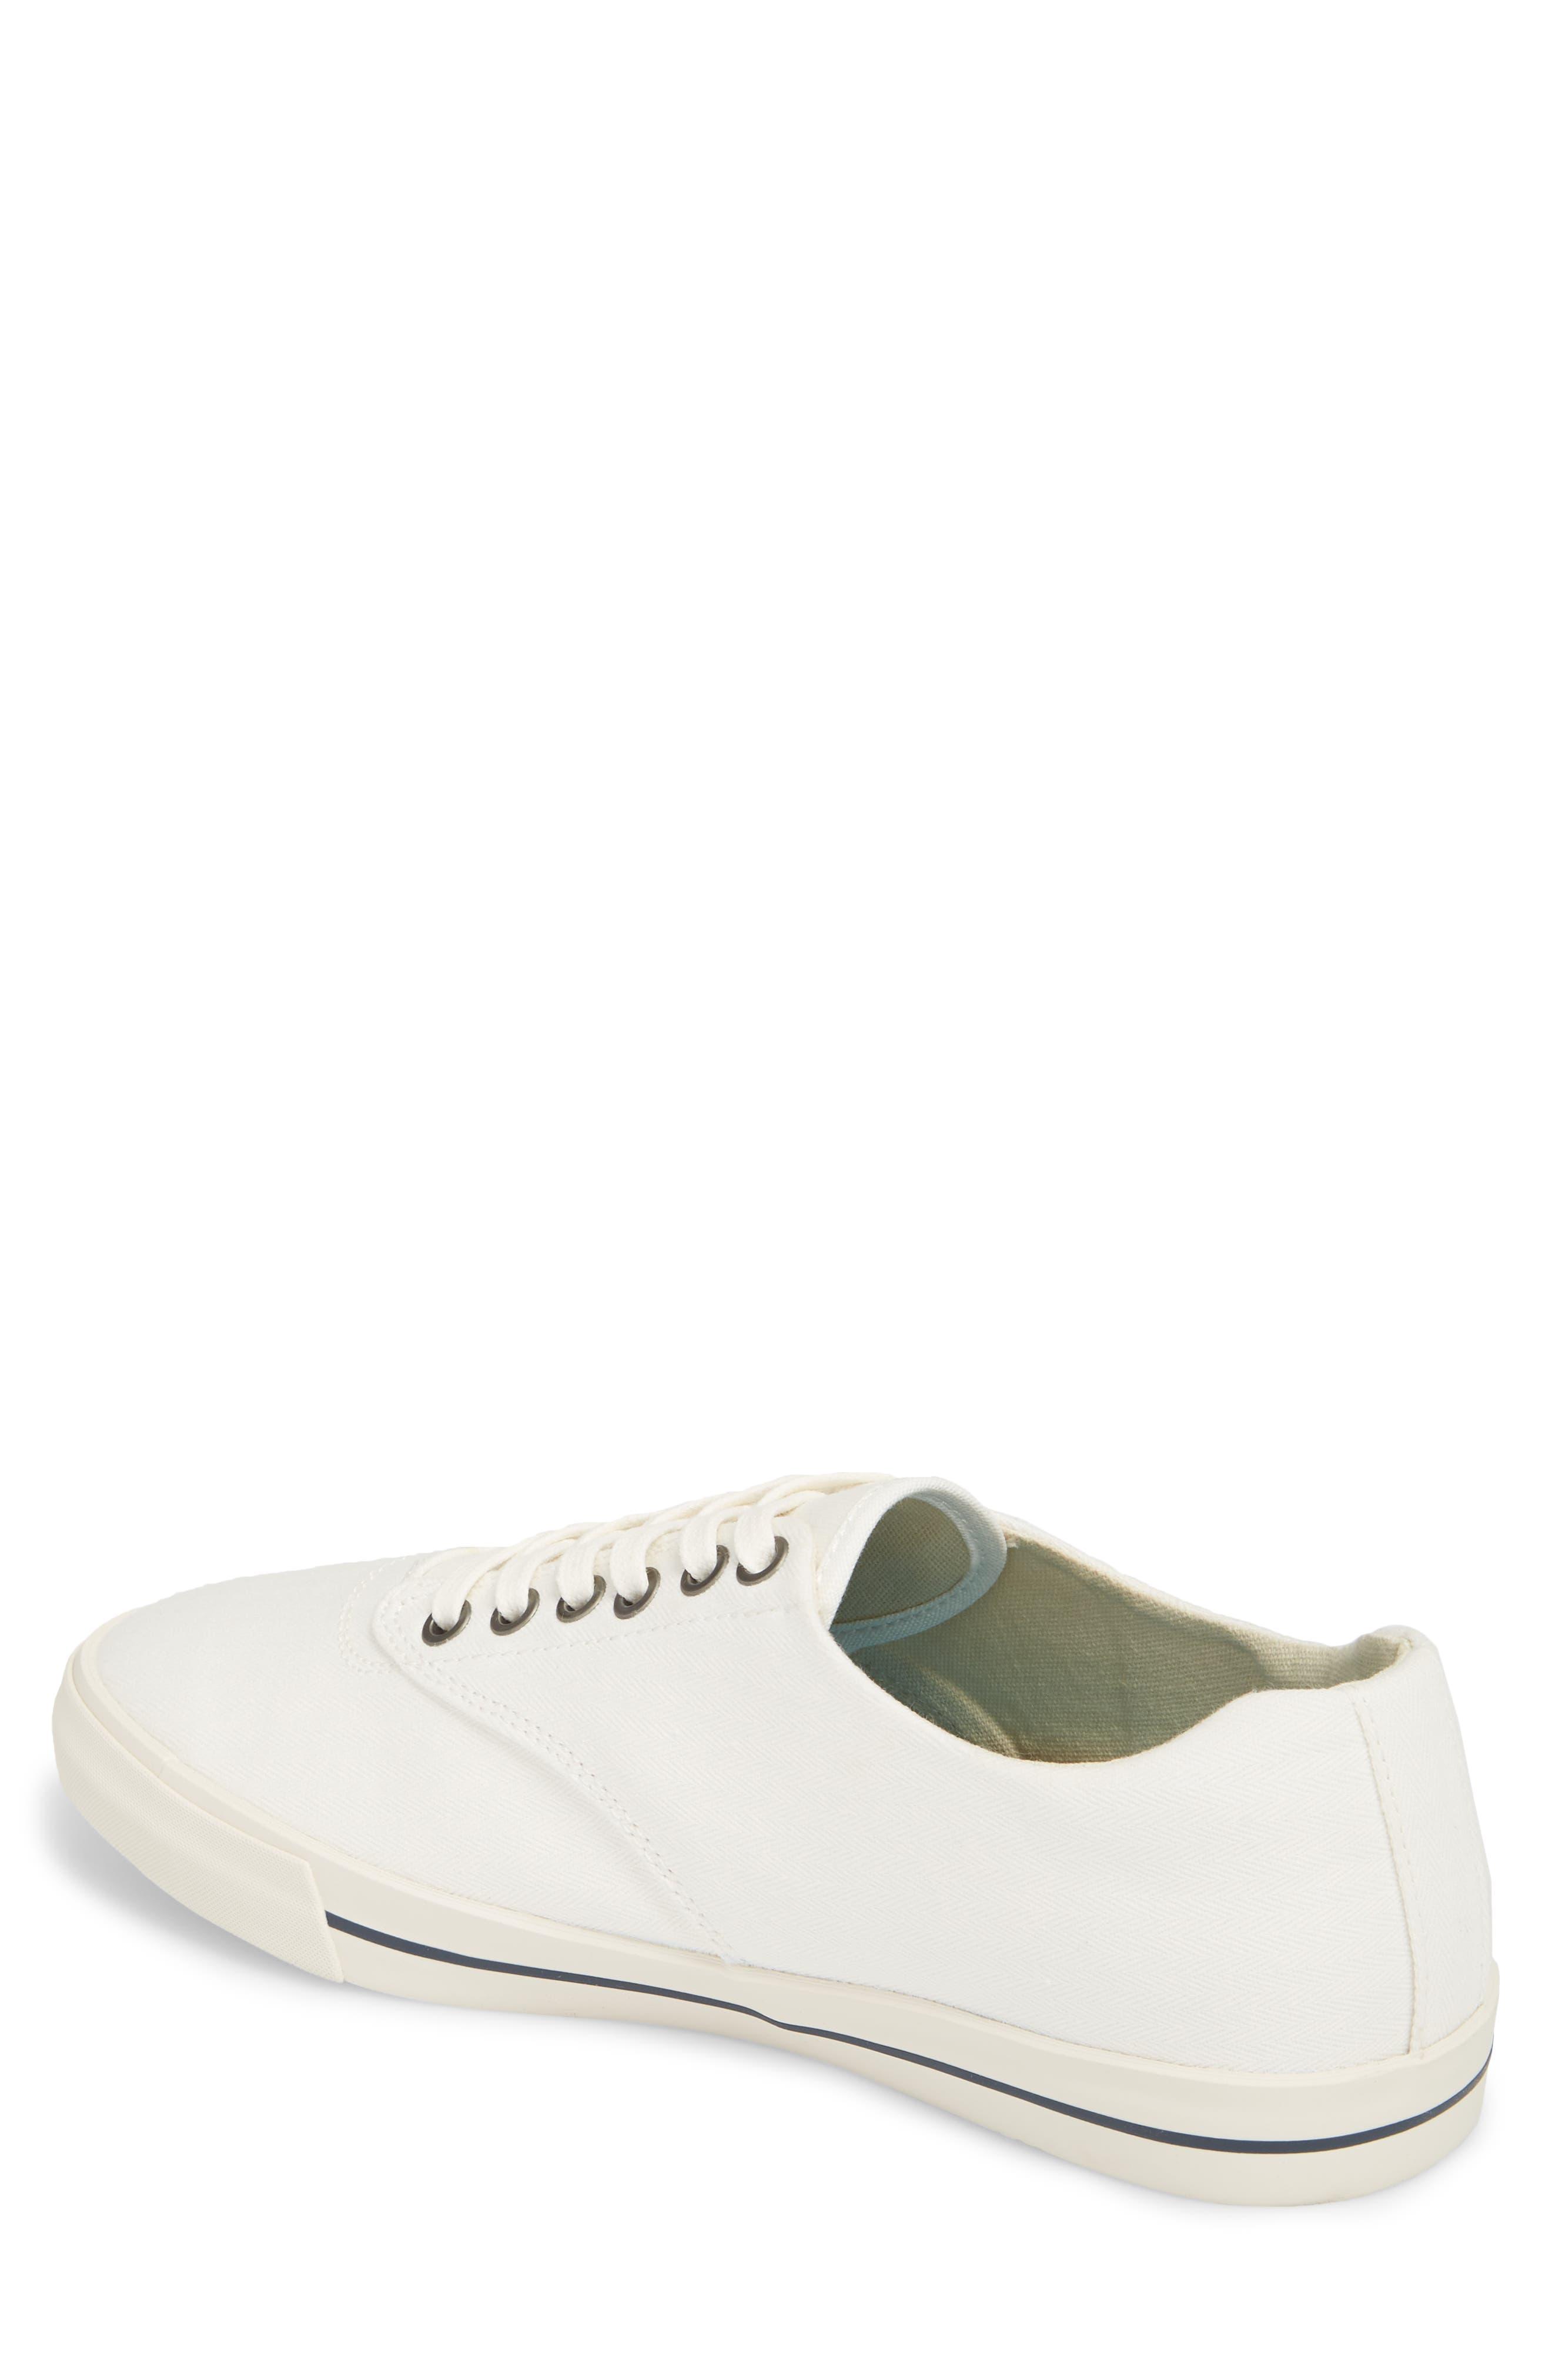 SEAVEES,                             Hermosa Plimsoll Sneaker,                             Alternate thumbnail 2, color,                             125